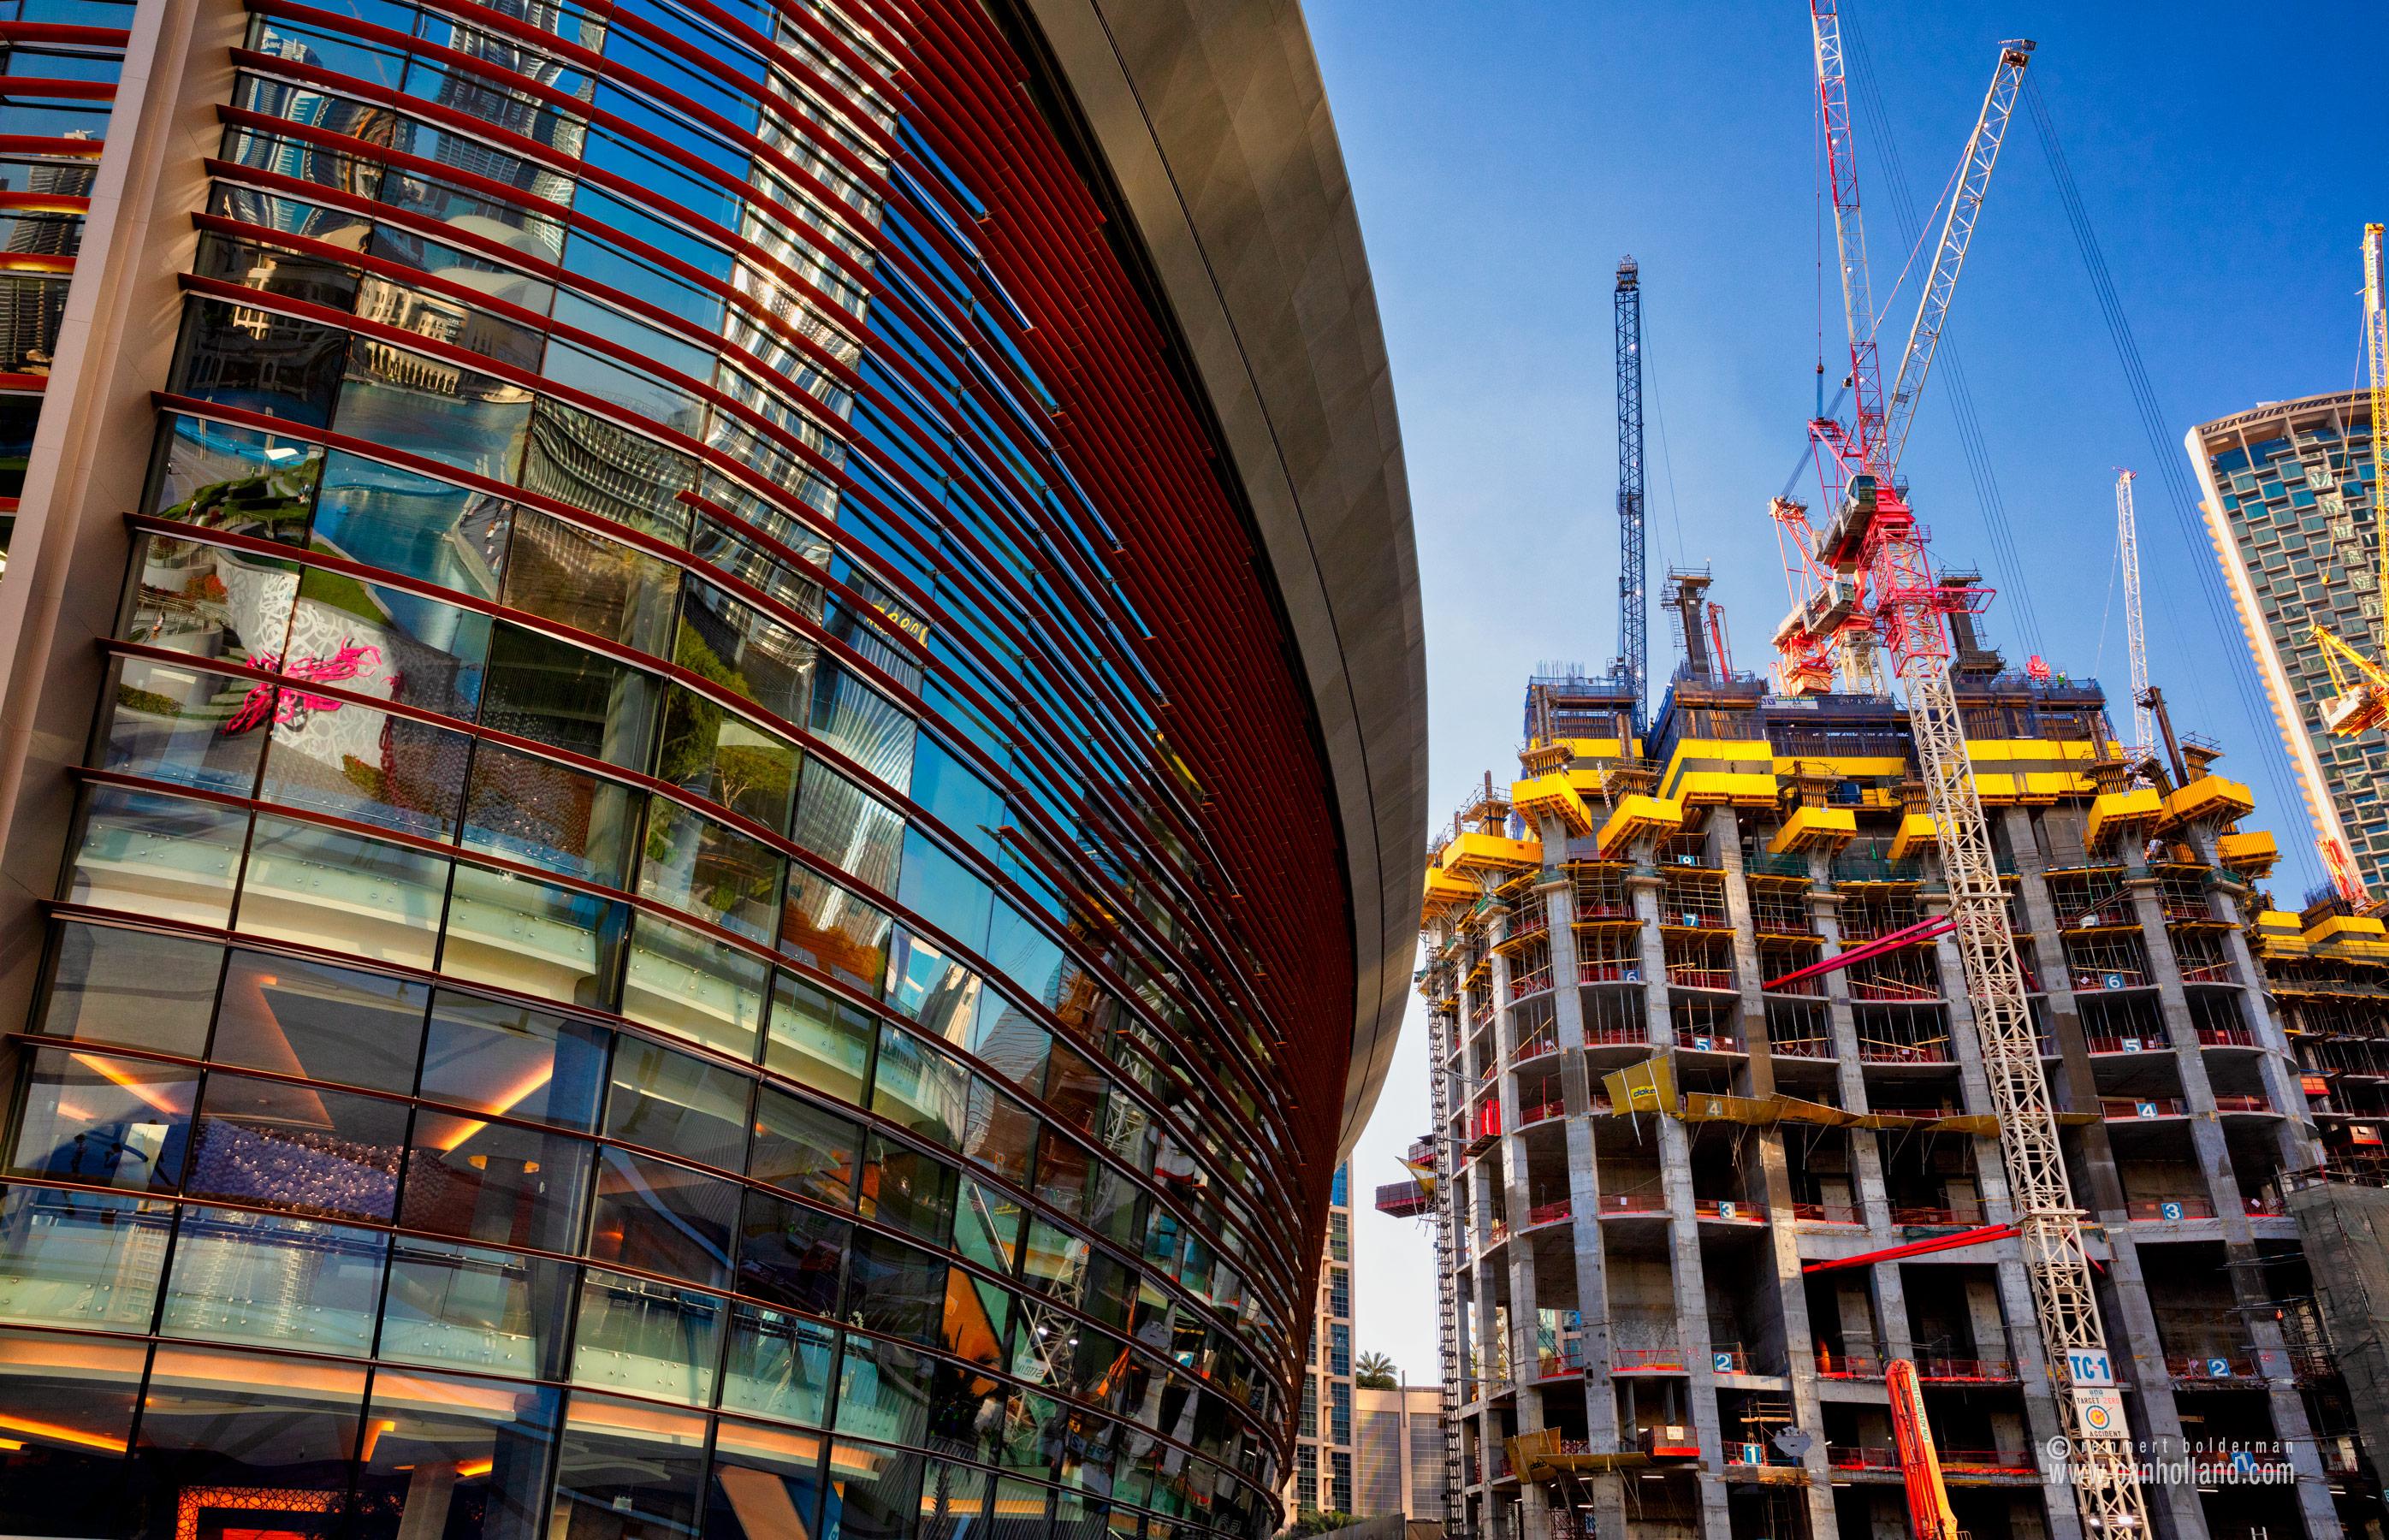 lego [ downtown ] dubai smart city development © remmert bolderman photography